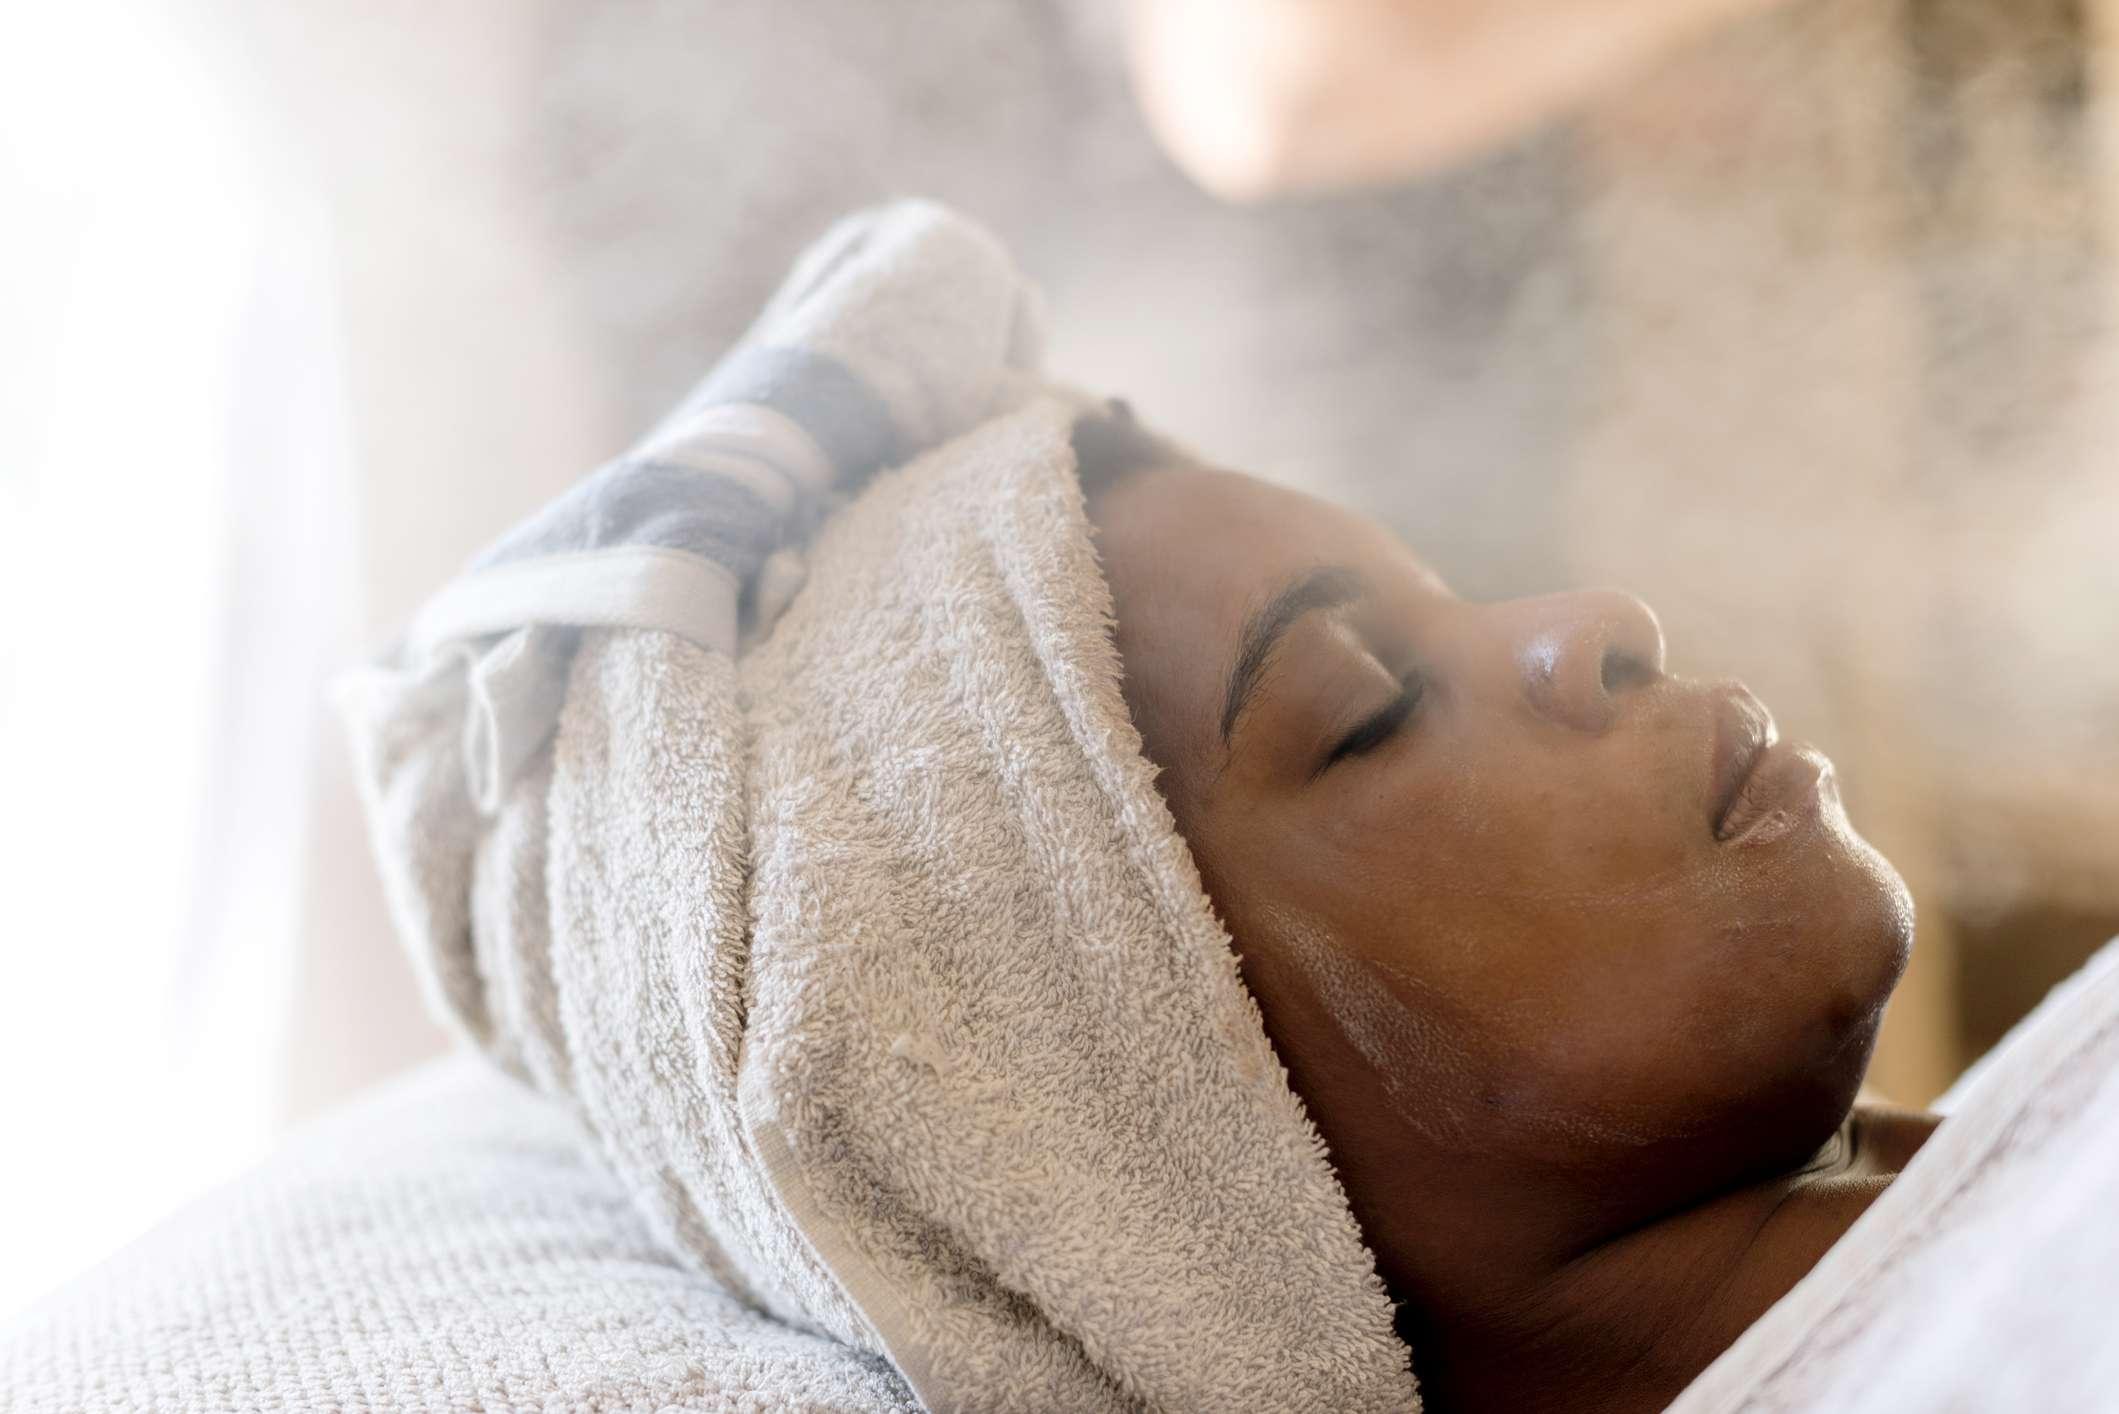 Woman receiving steam treatment